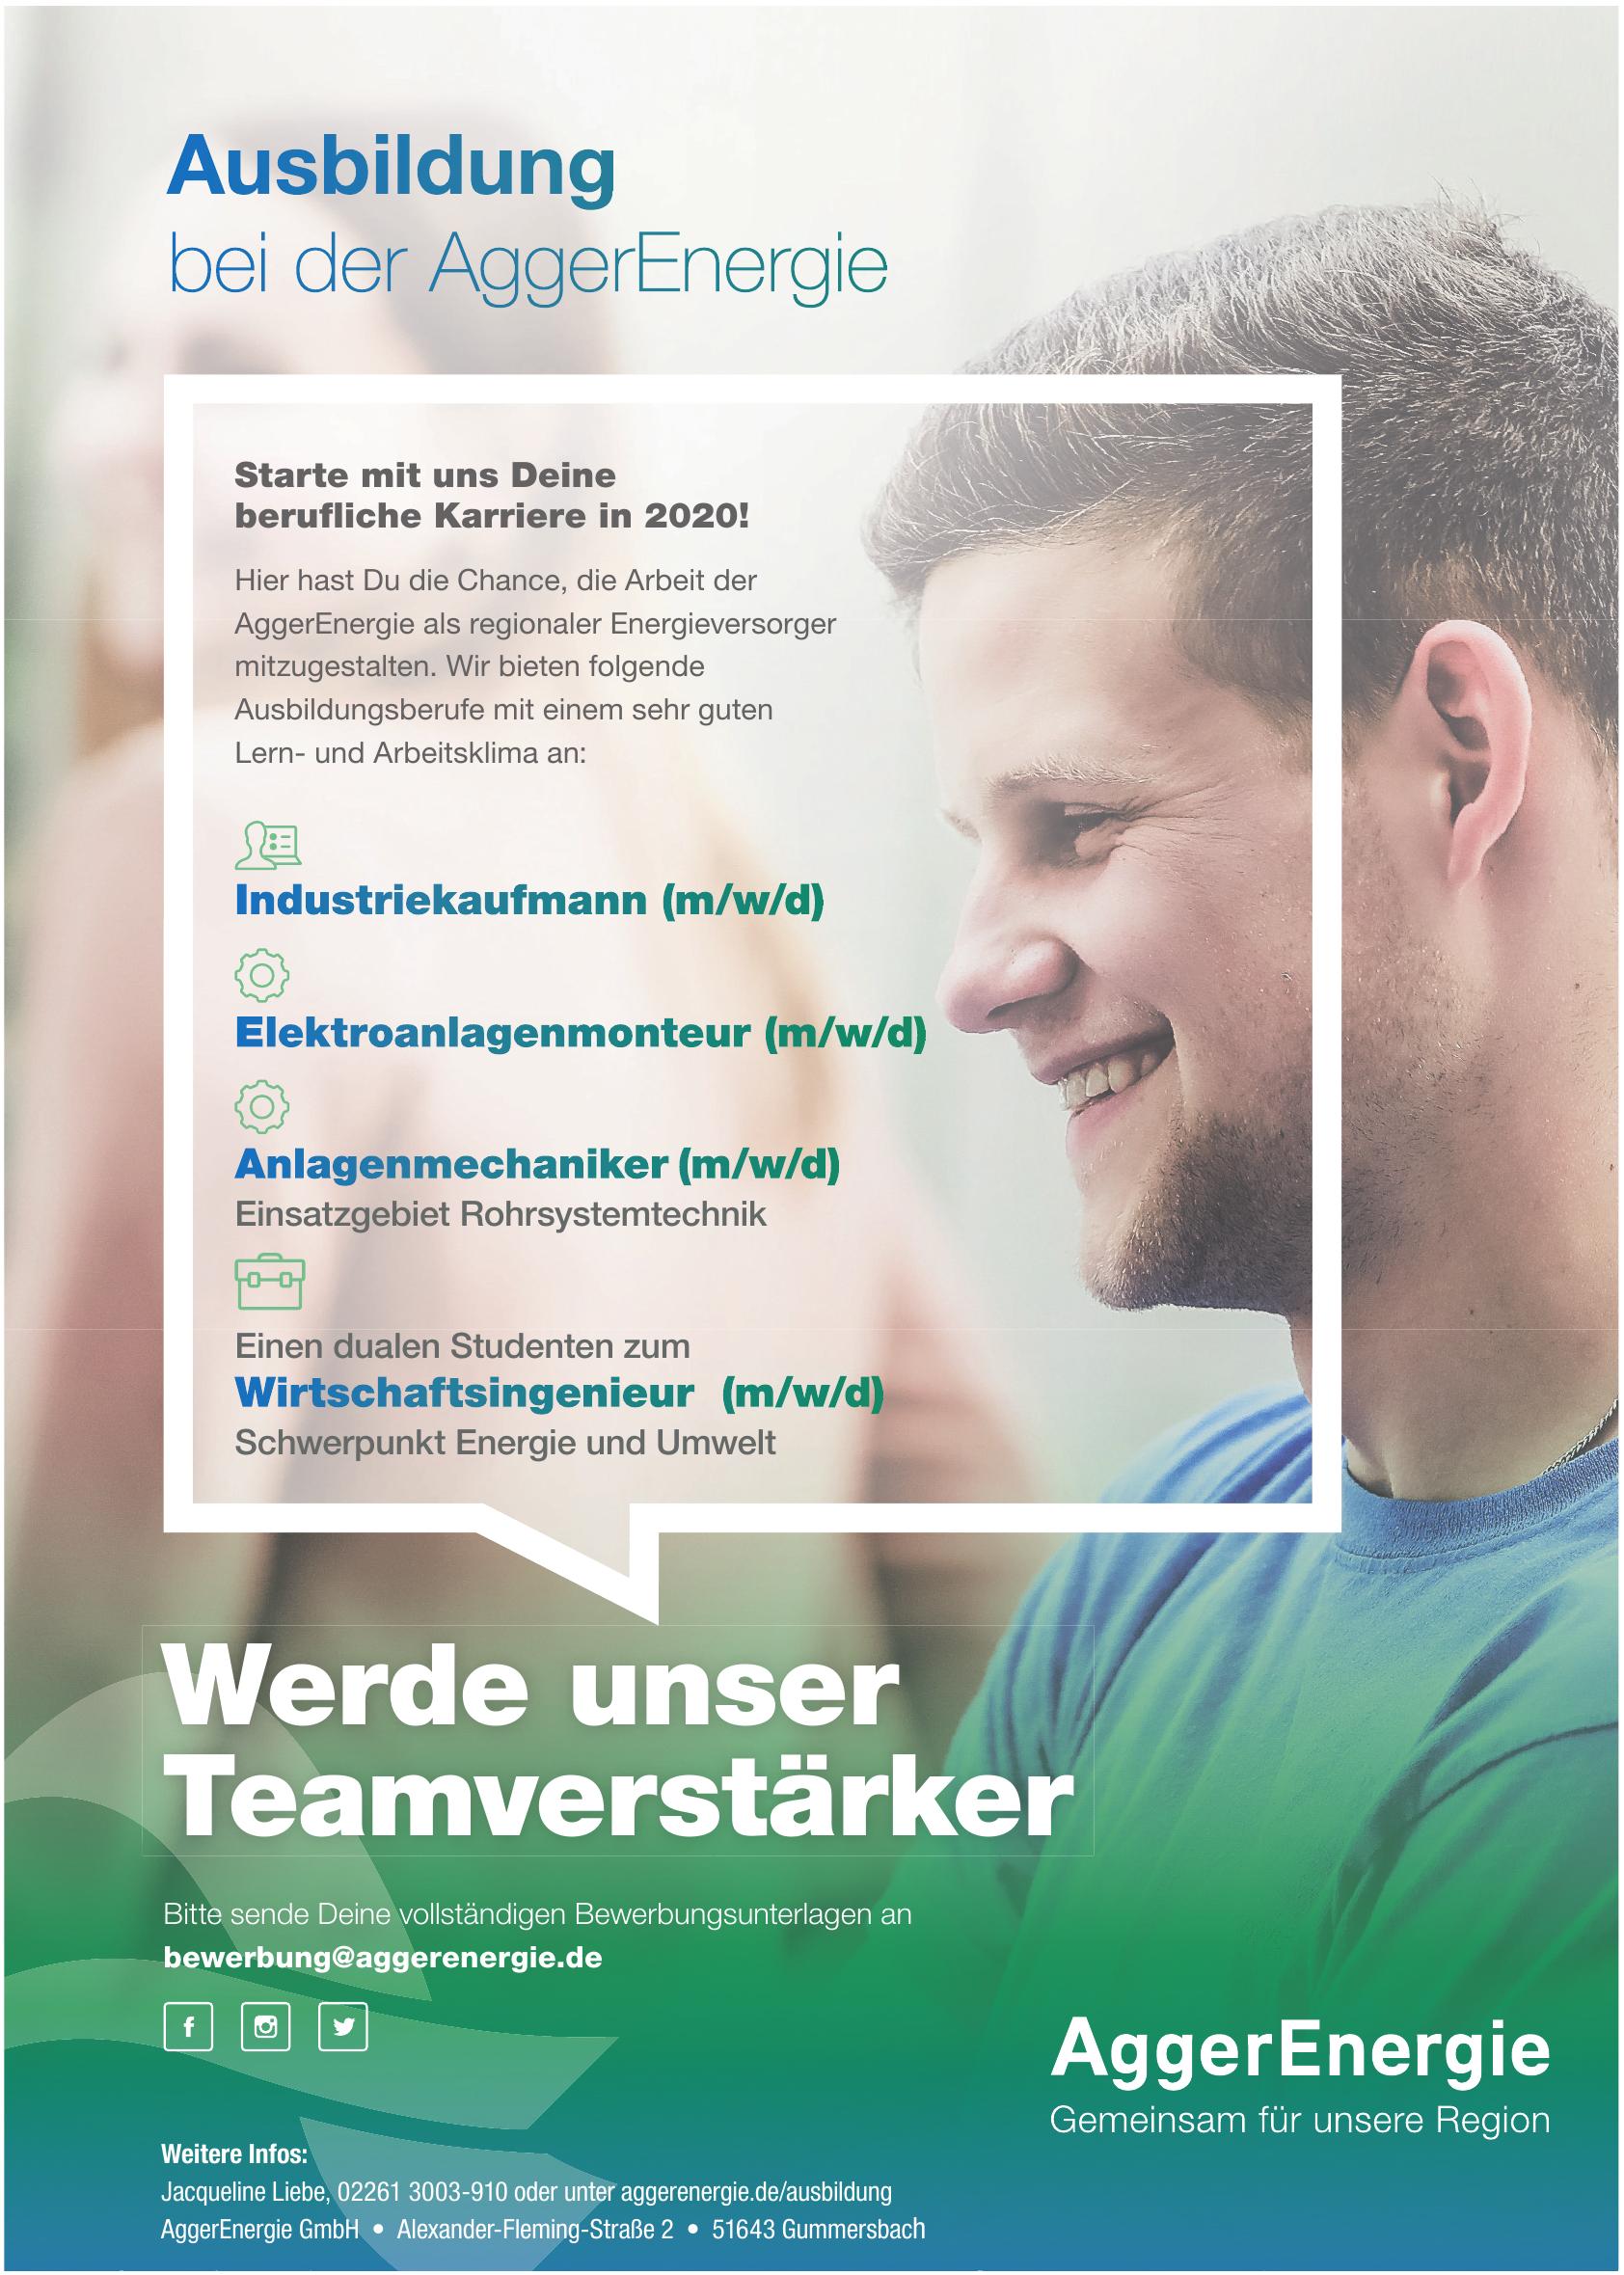 AggerEnergie GmbH